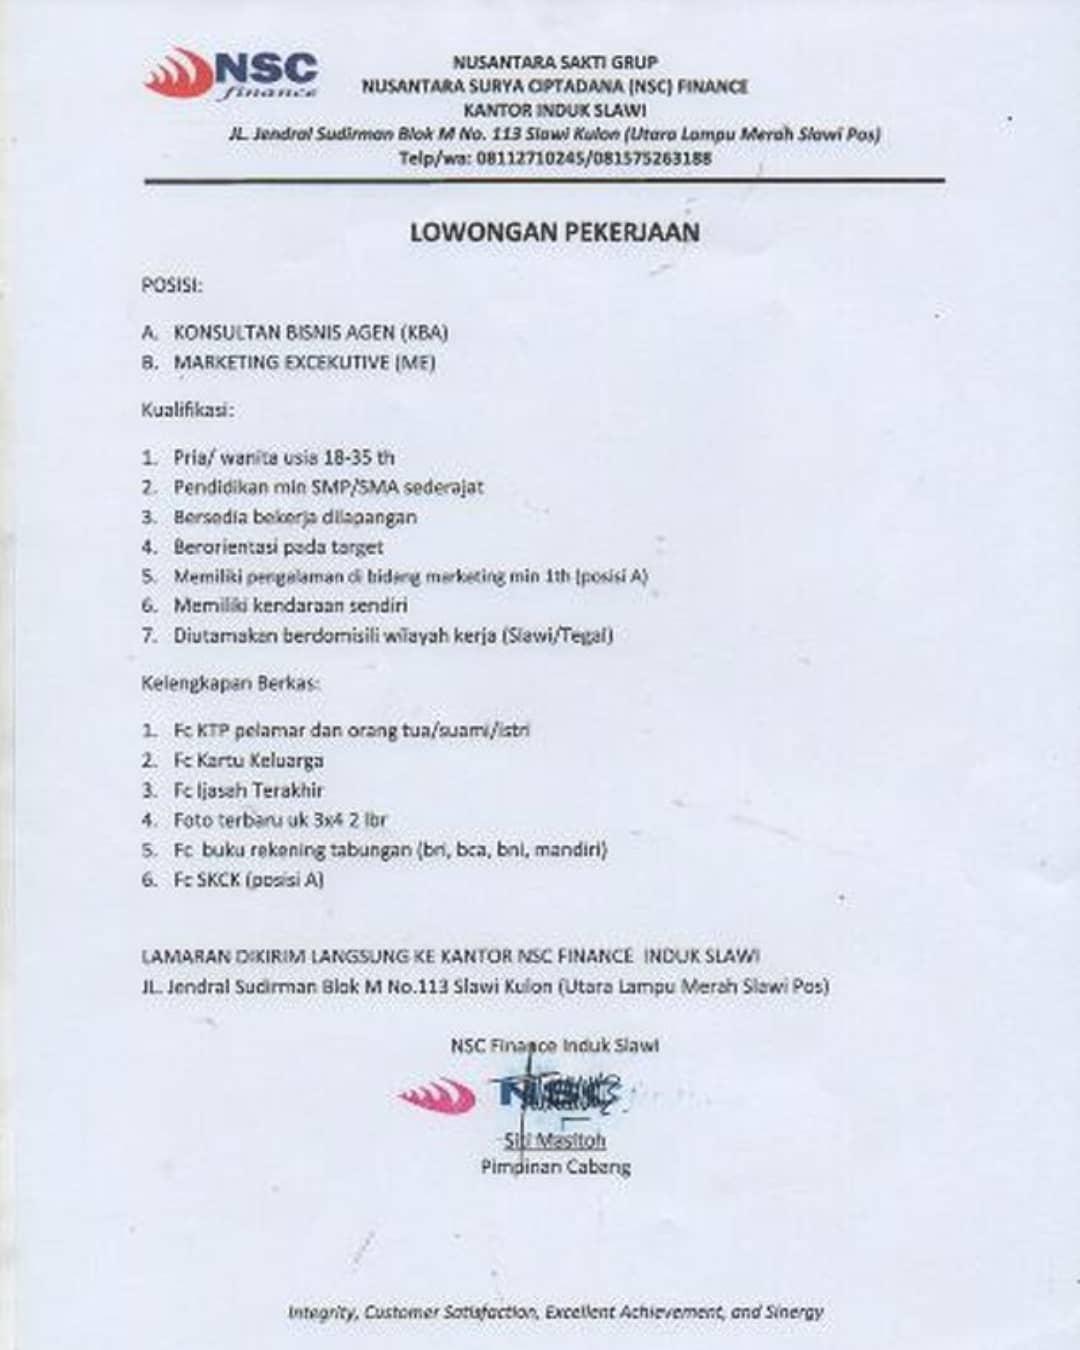 NSC Finance Induk Slawi